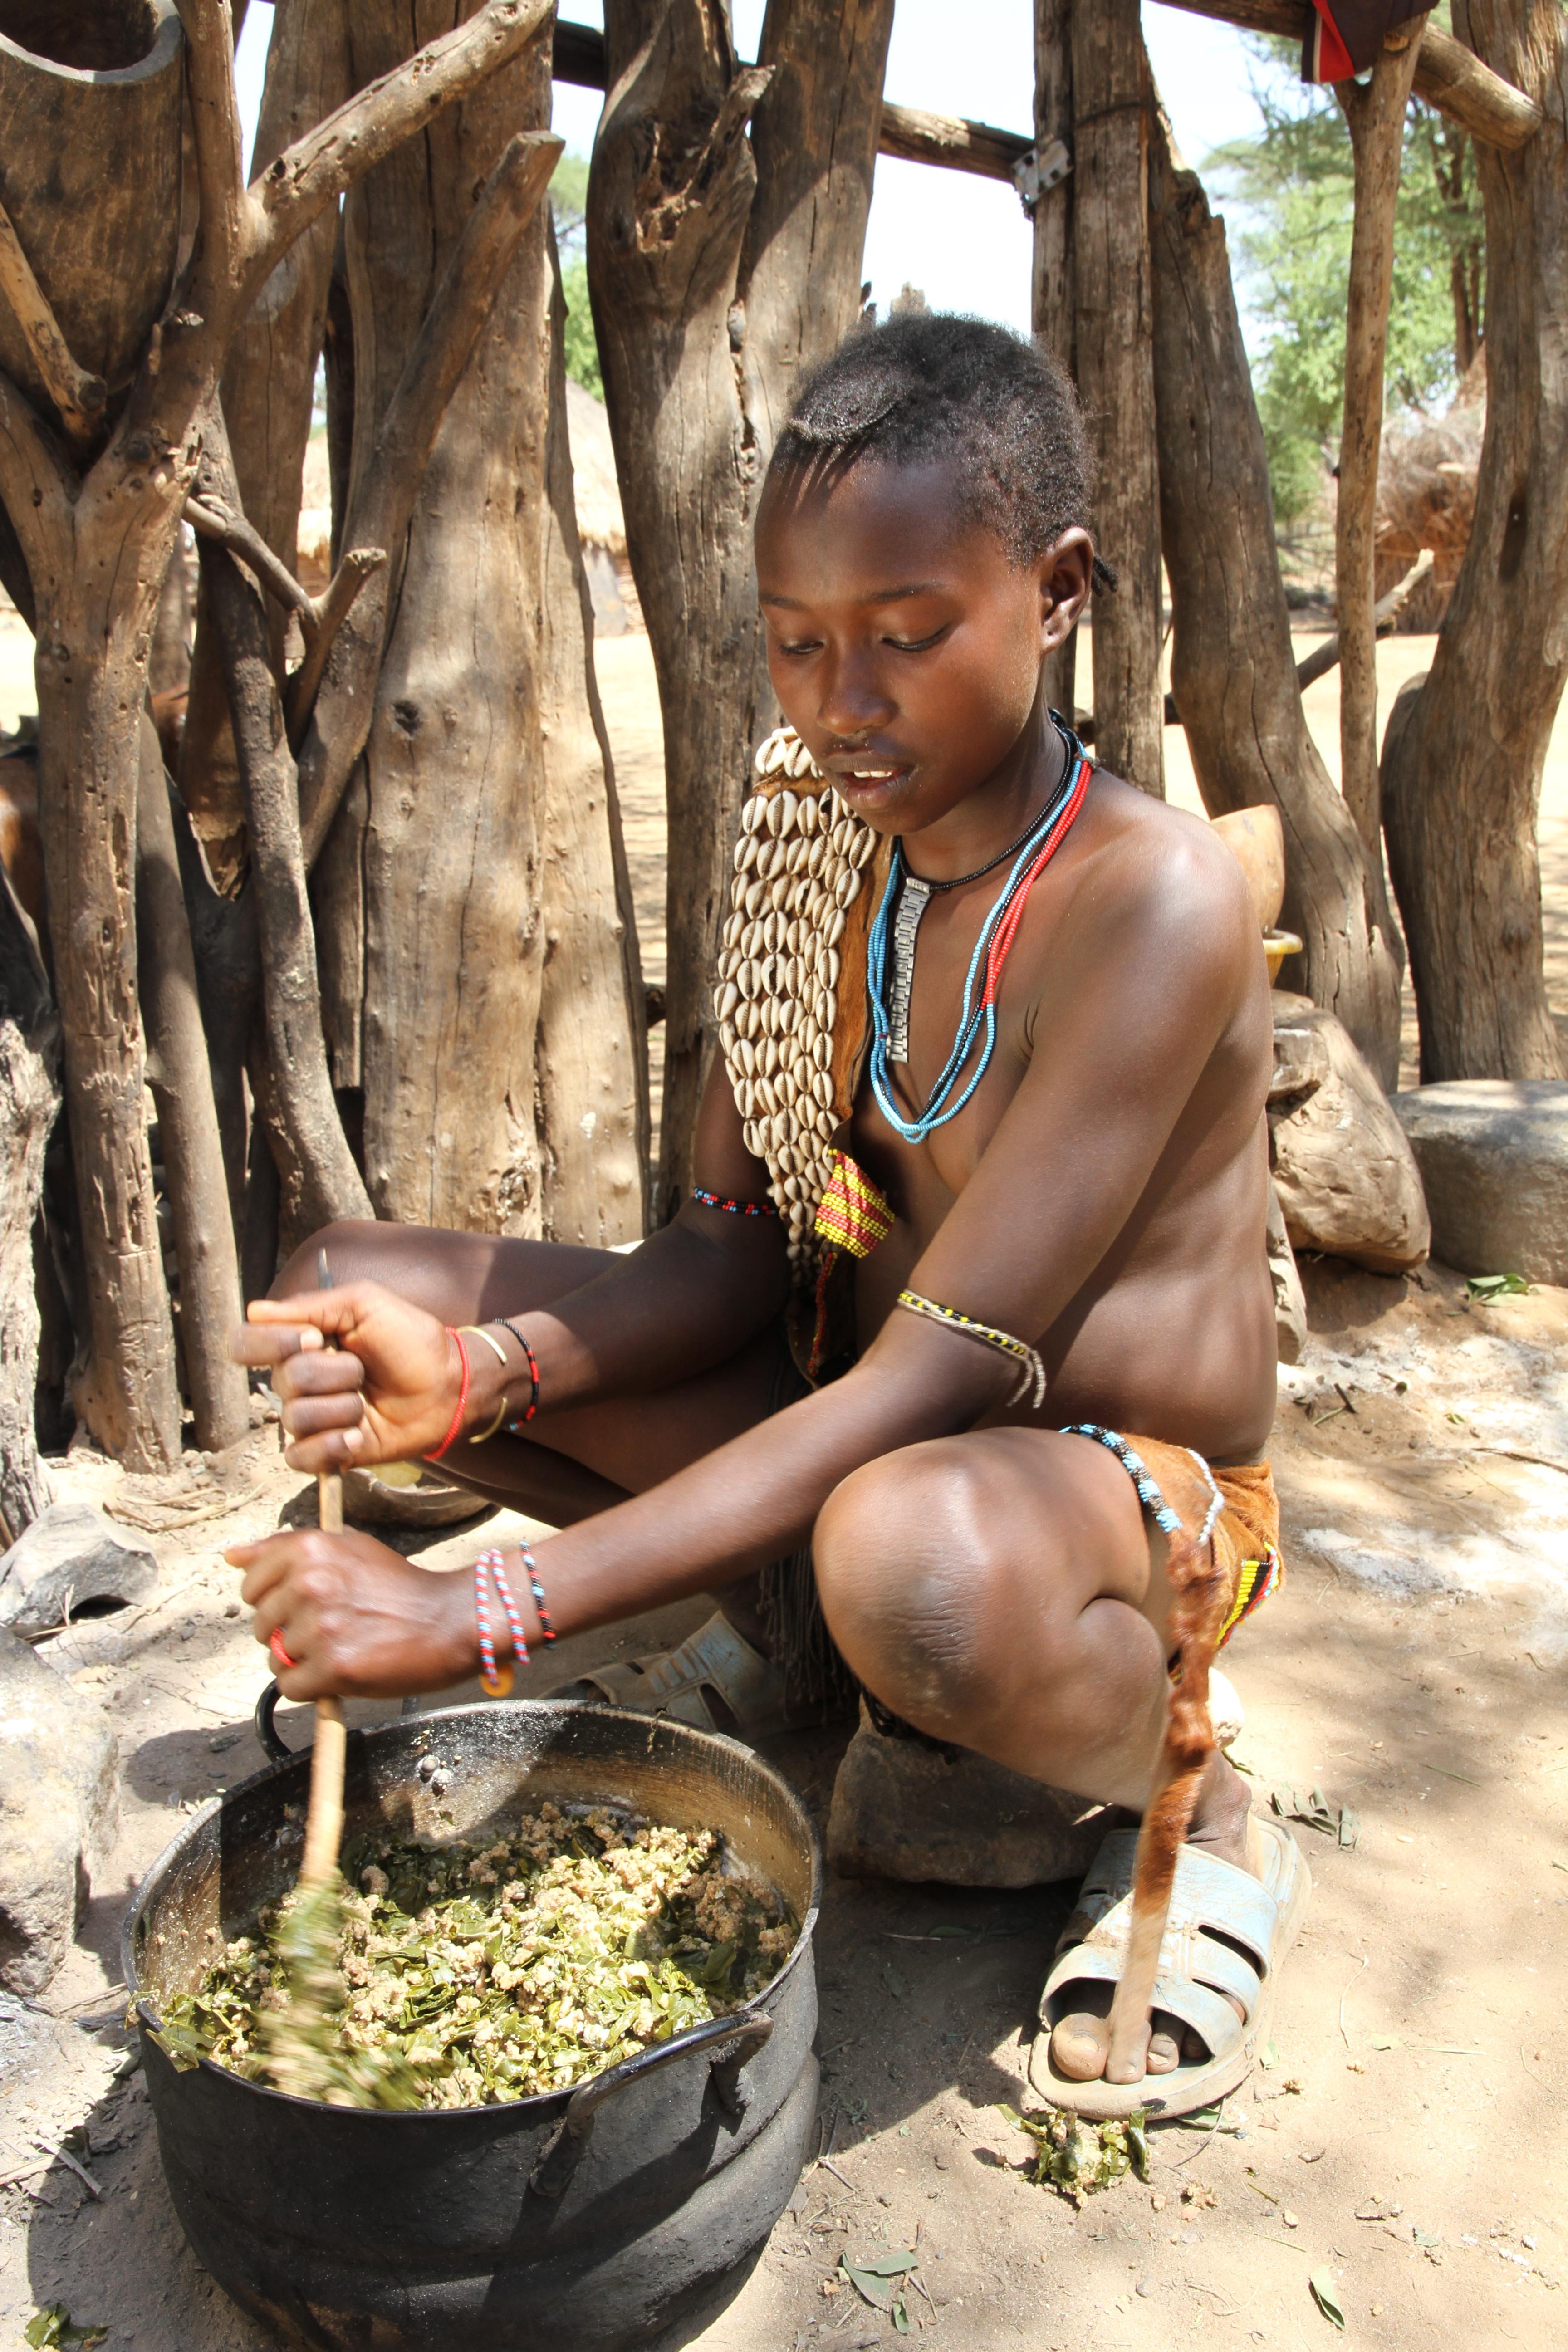 Äthiopien, Urvölker